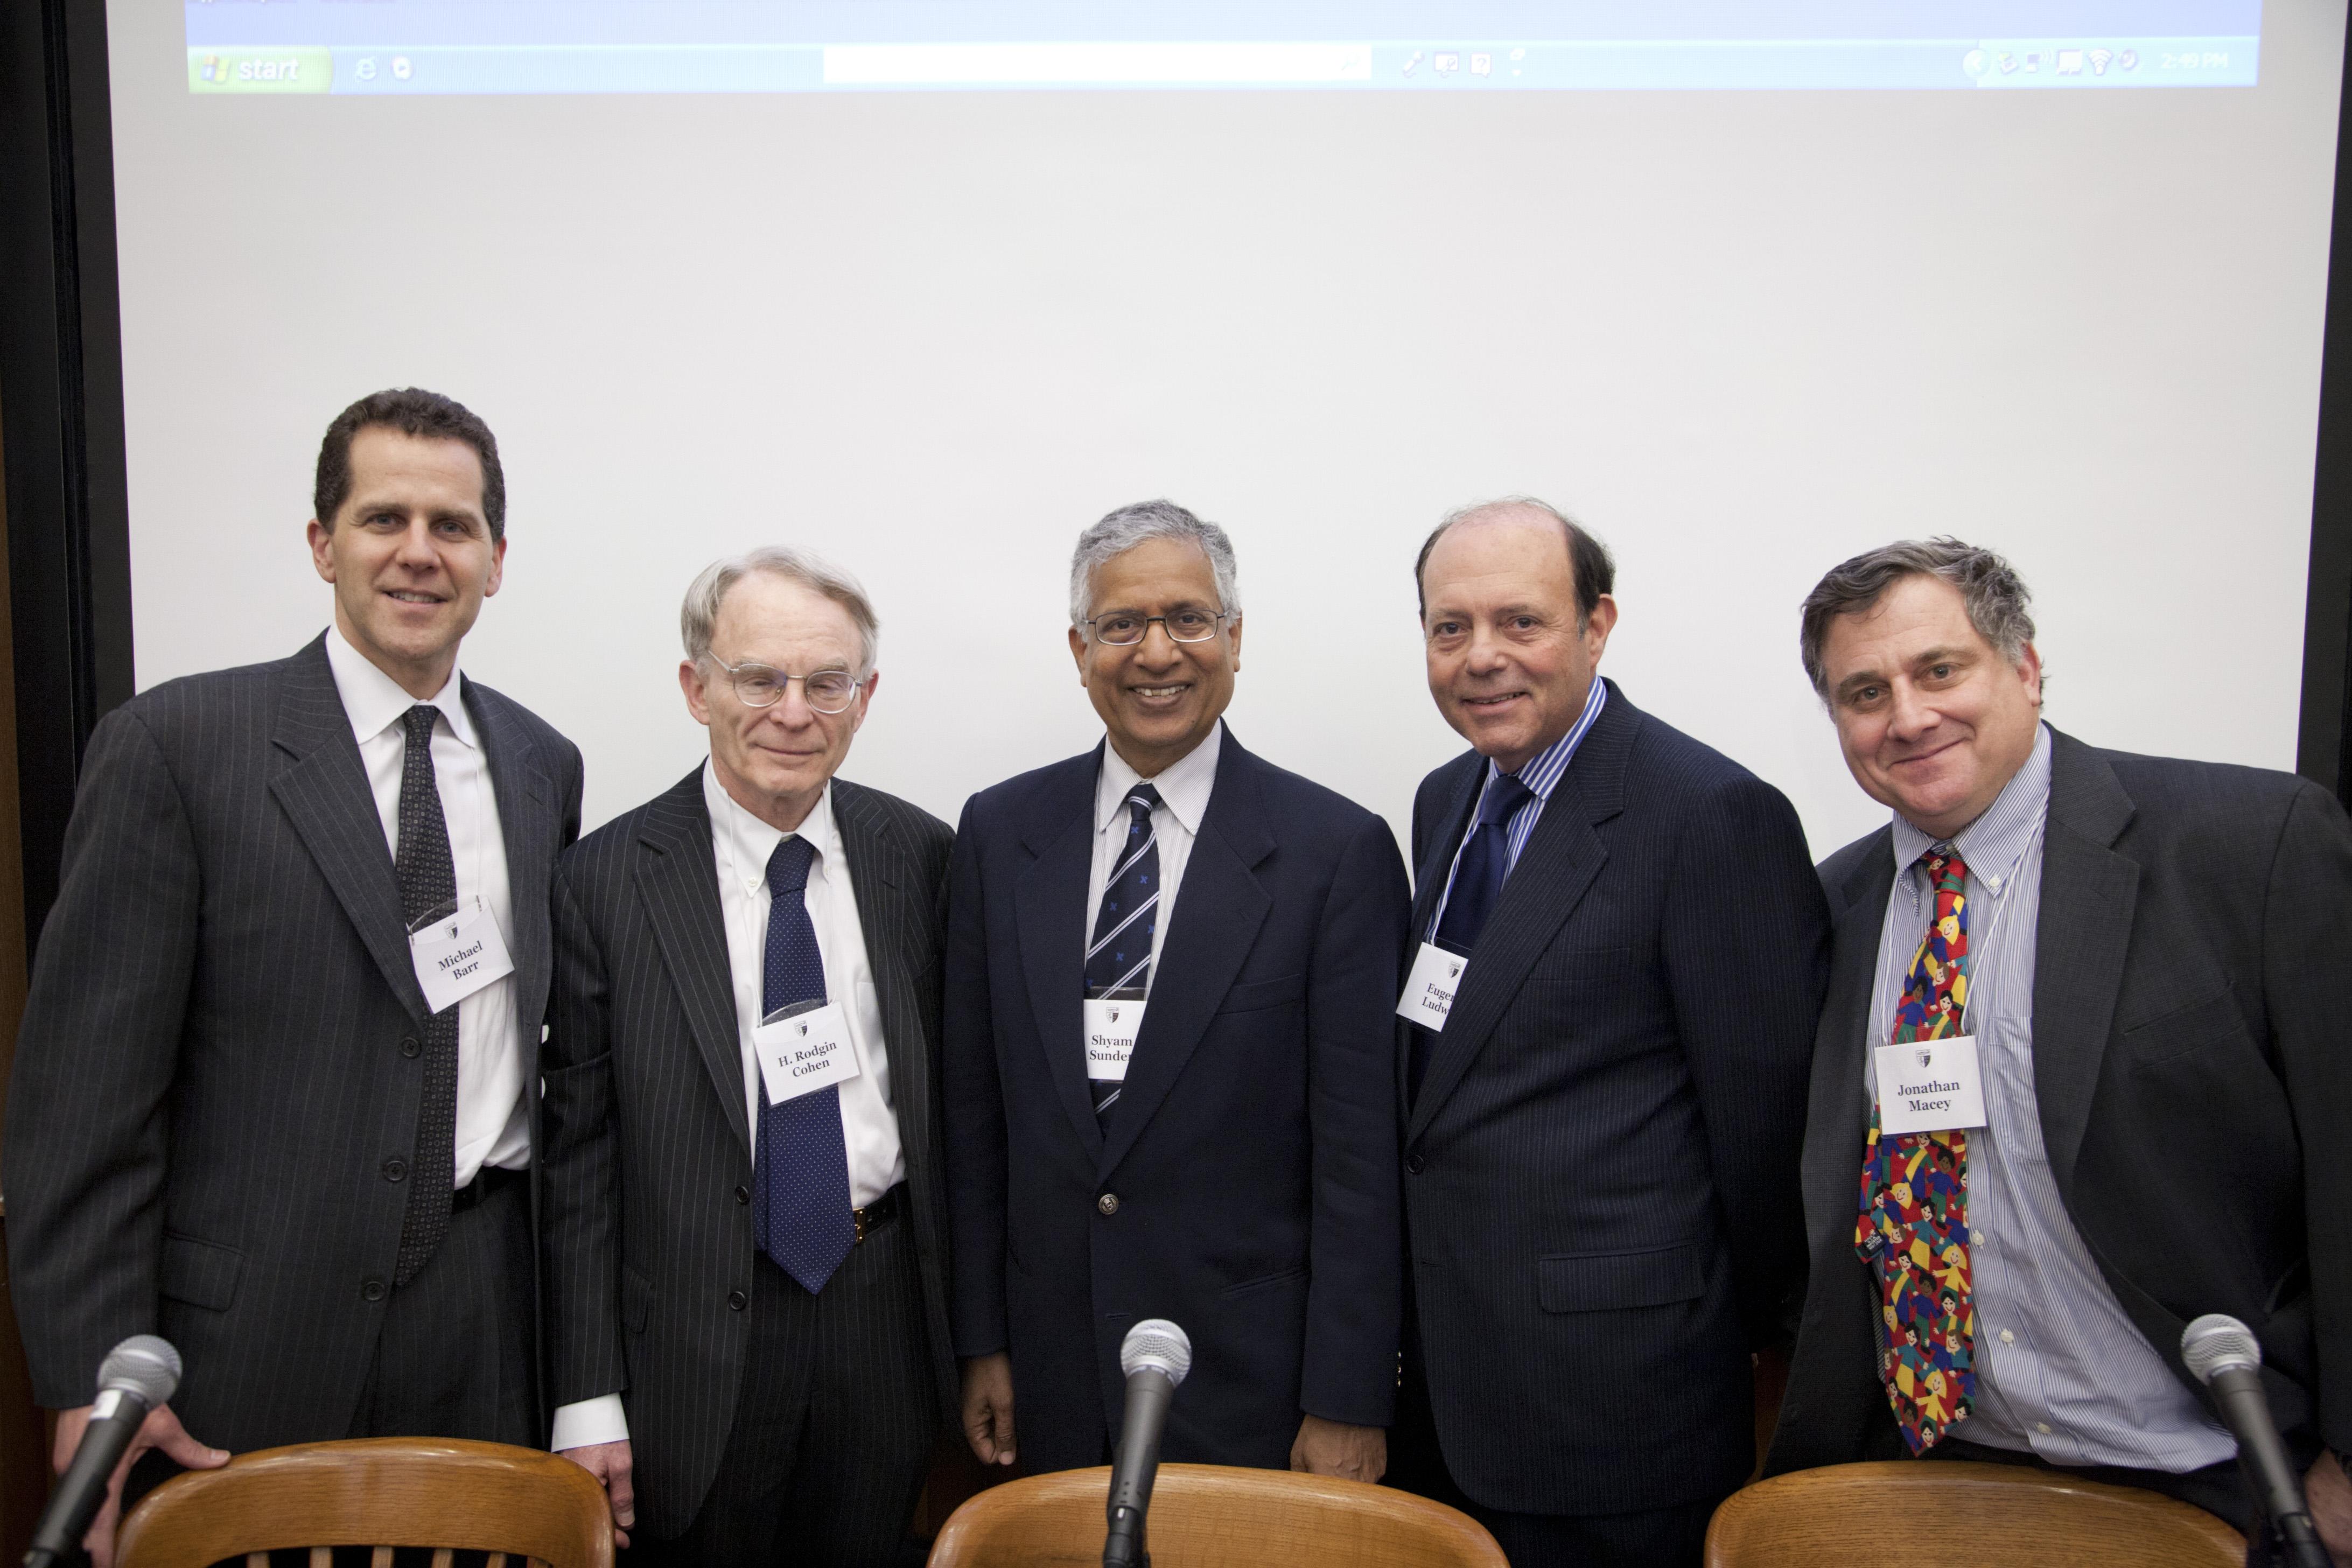 Michigan Law Prof. Michael Barr '92, H. Rodgin Cohen, Yale SOM Prof. Shyam Sunder, Eugene Ludwig '73, and YLS Prof. Jonathan Macey '82